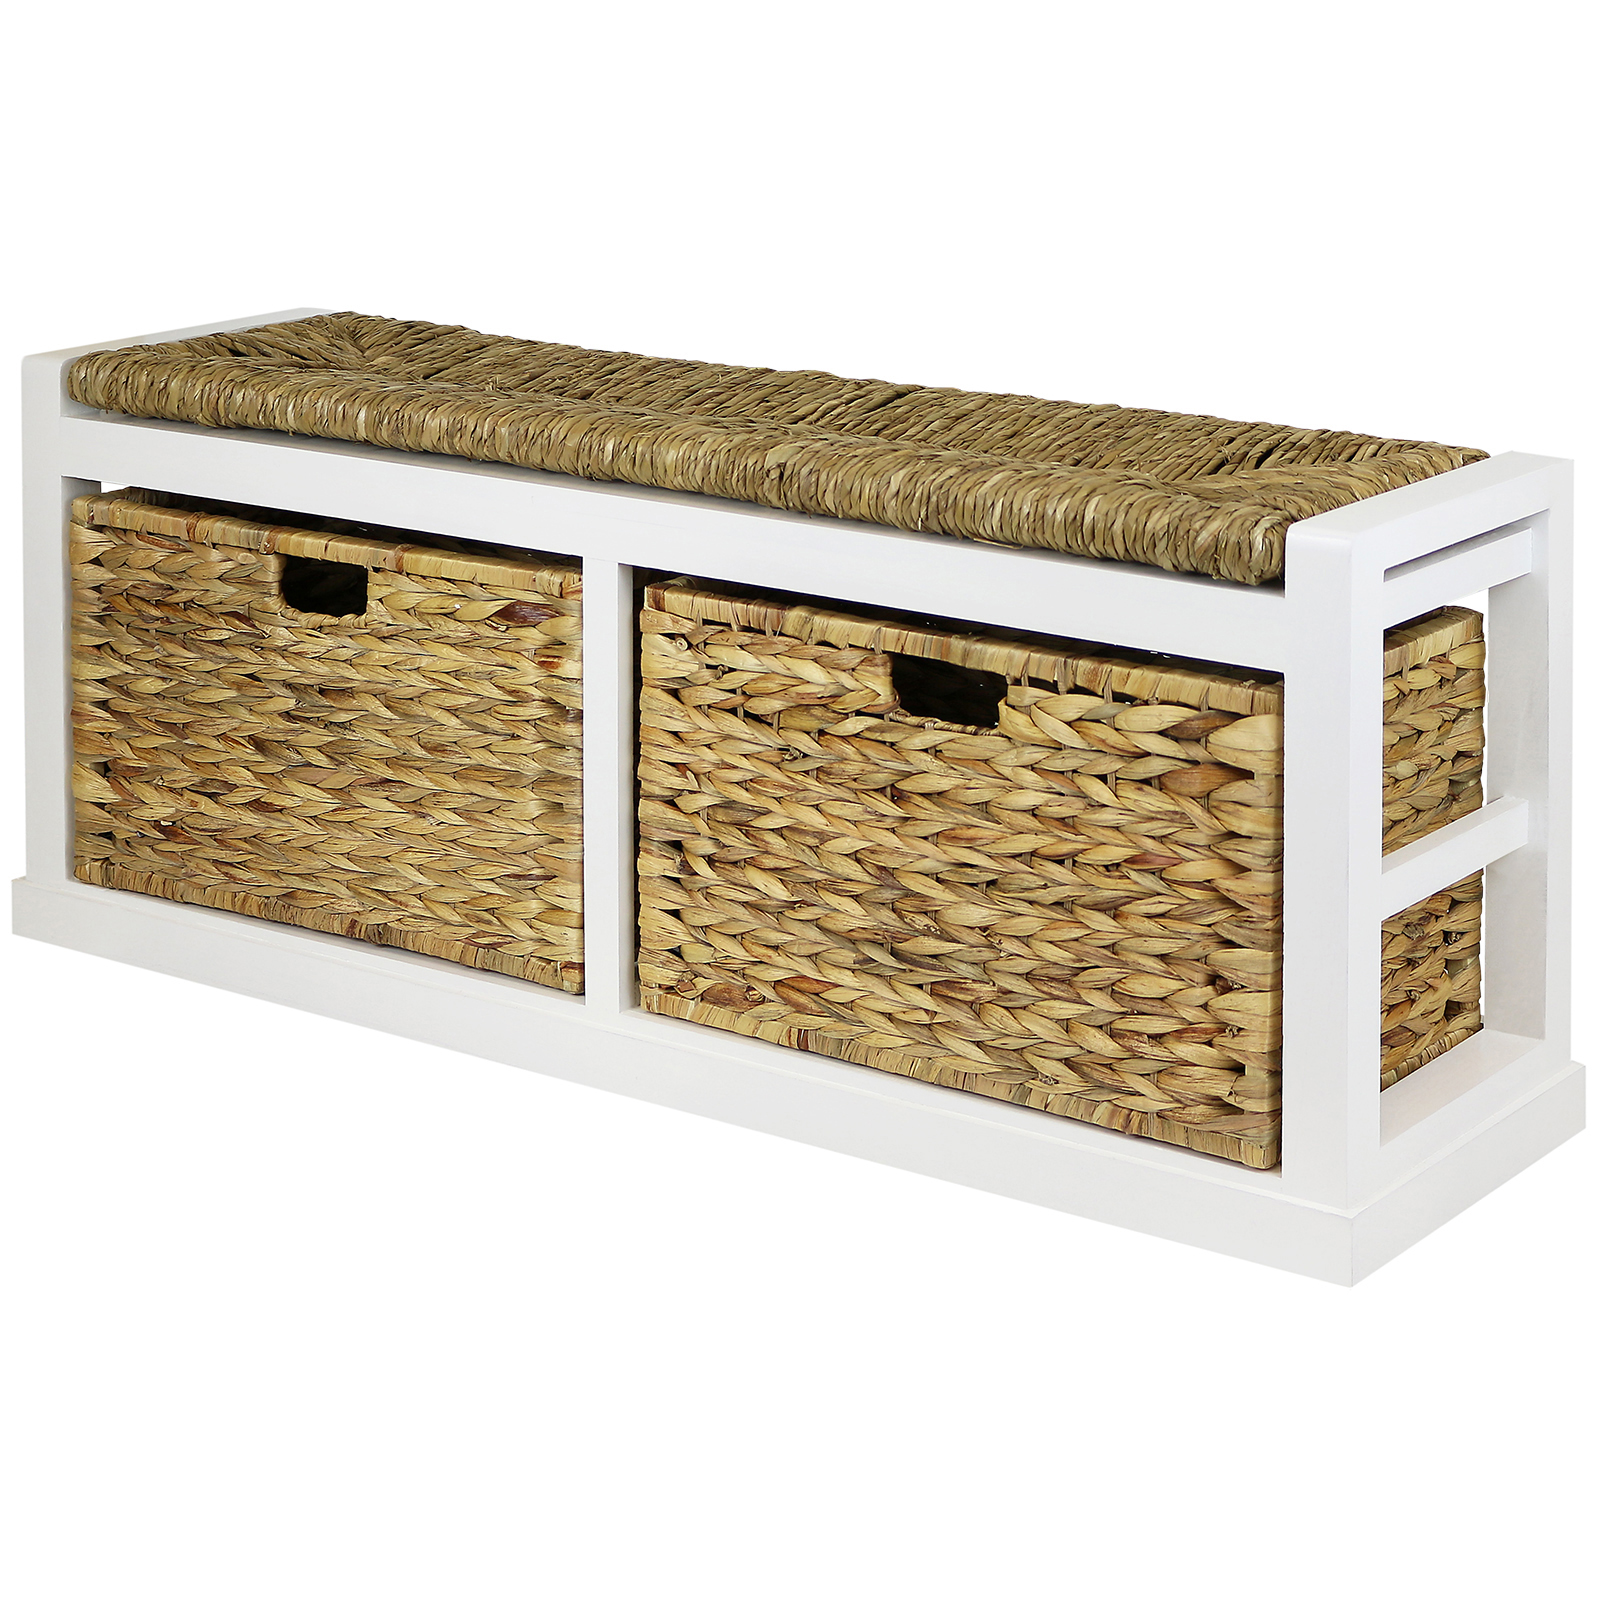 Sale Hartleys Wide 2 Drawer Bench Wicker Seat Cushion Basket Damaged 071 Ebay